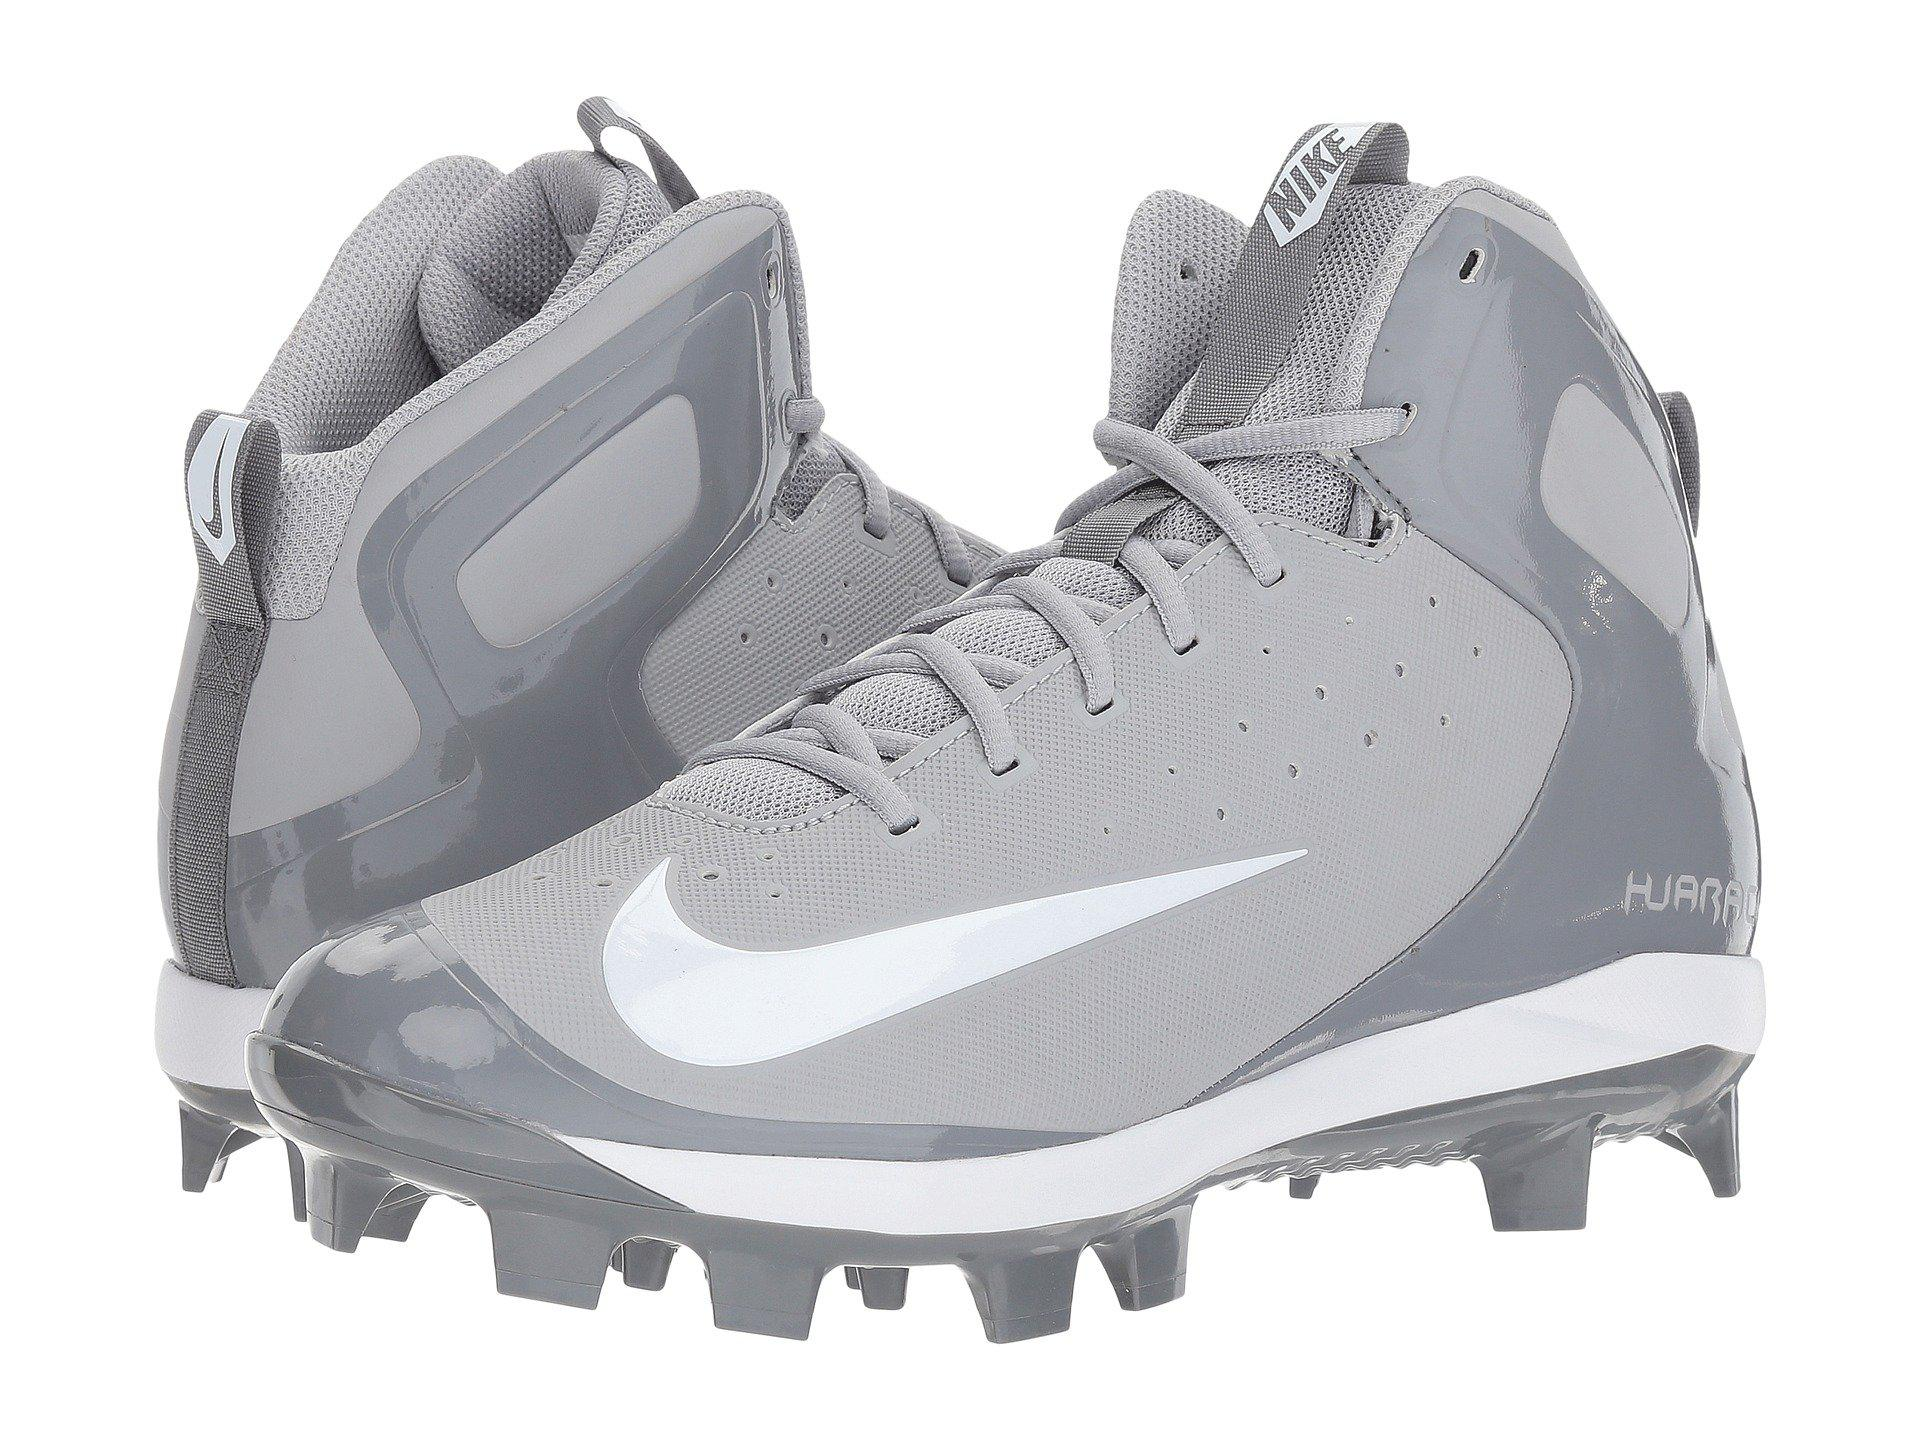 c597f8ada2bf Lyst - Nike Alpha Huarache Pro Mid Mcs in Gray for Men